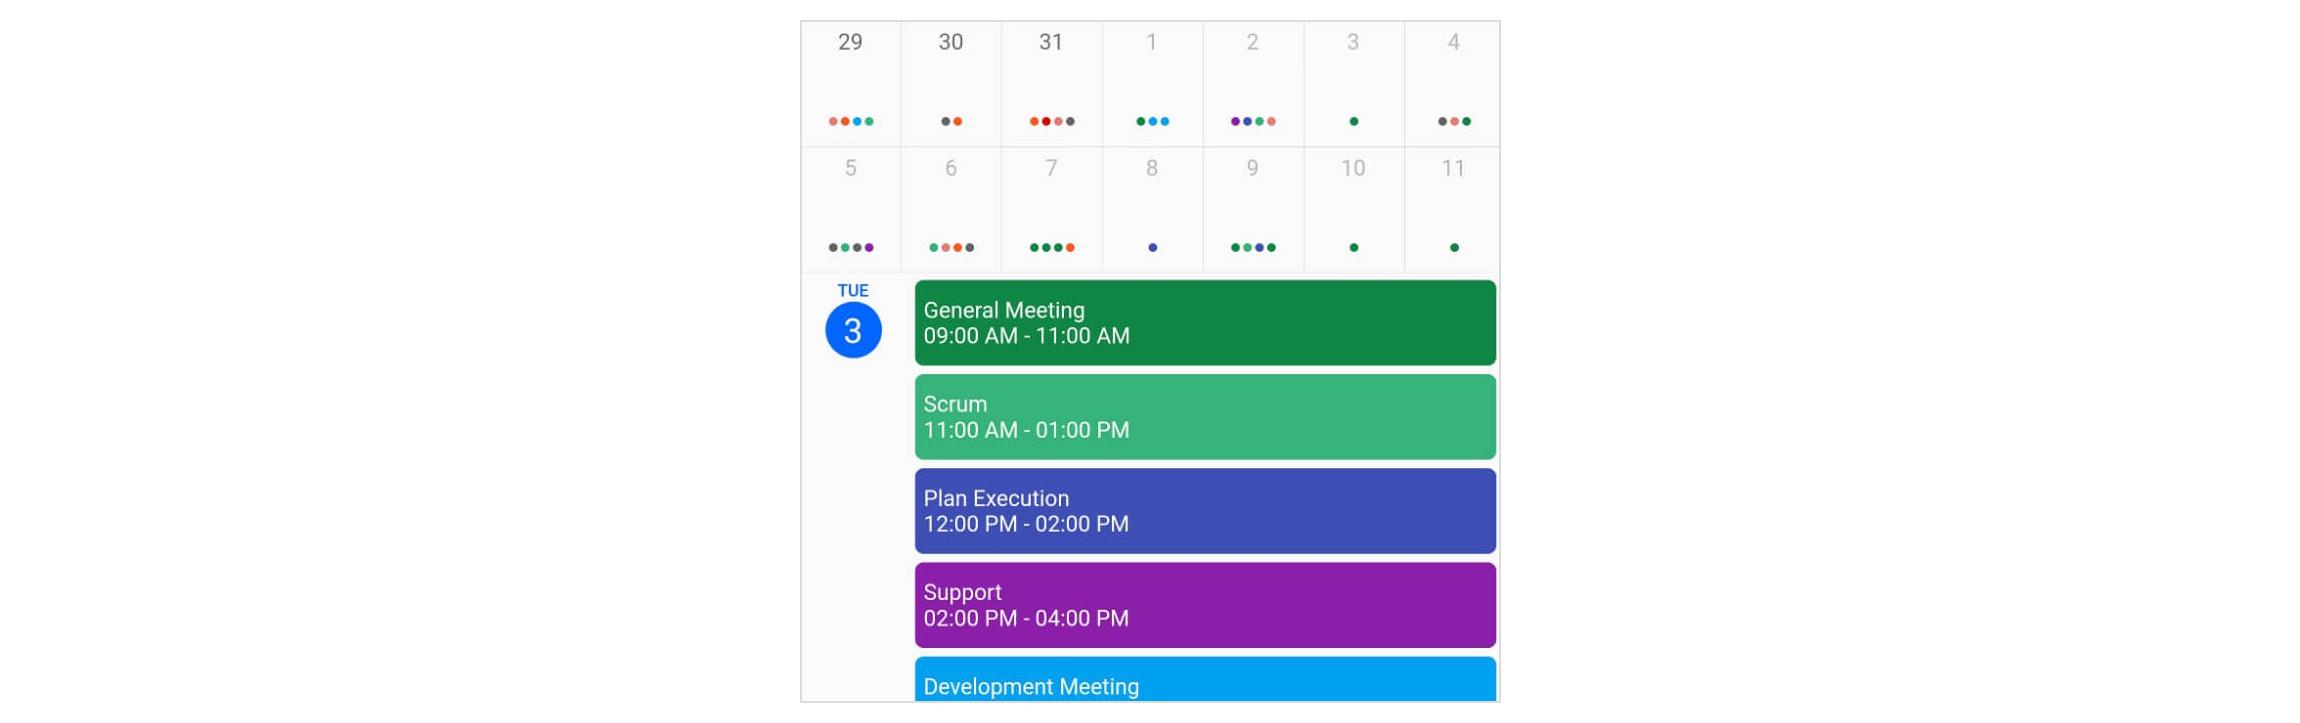 month_agenda_view